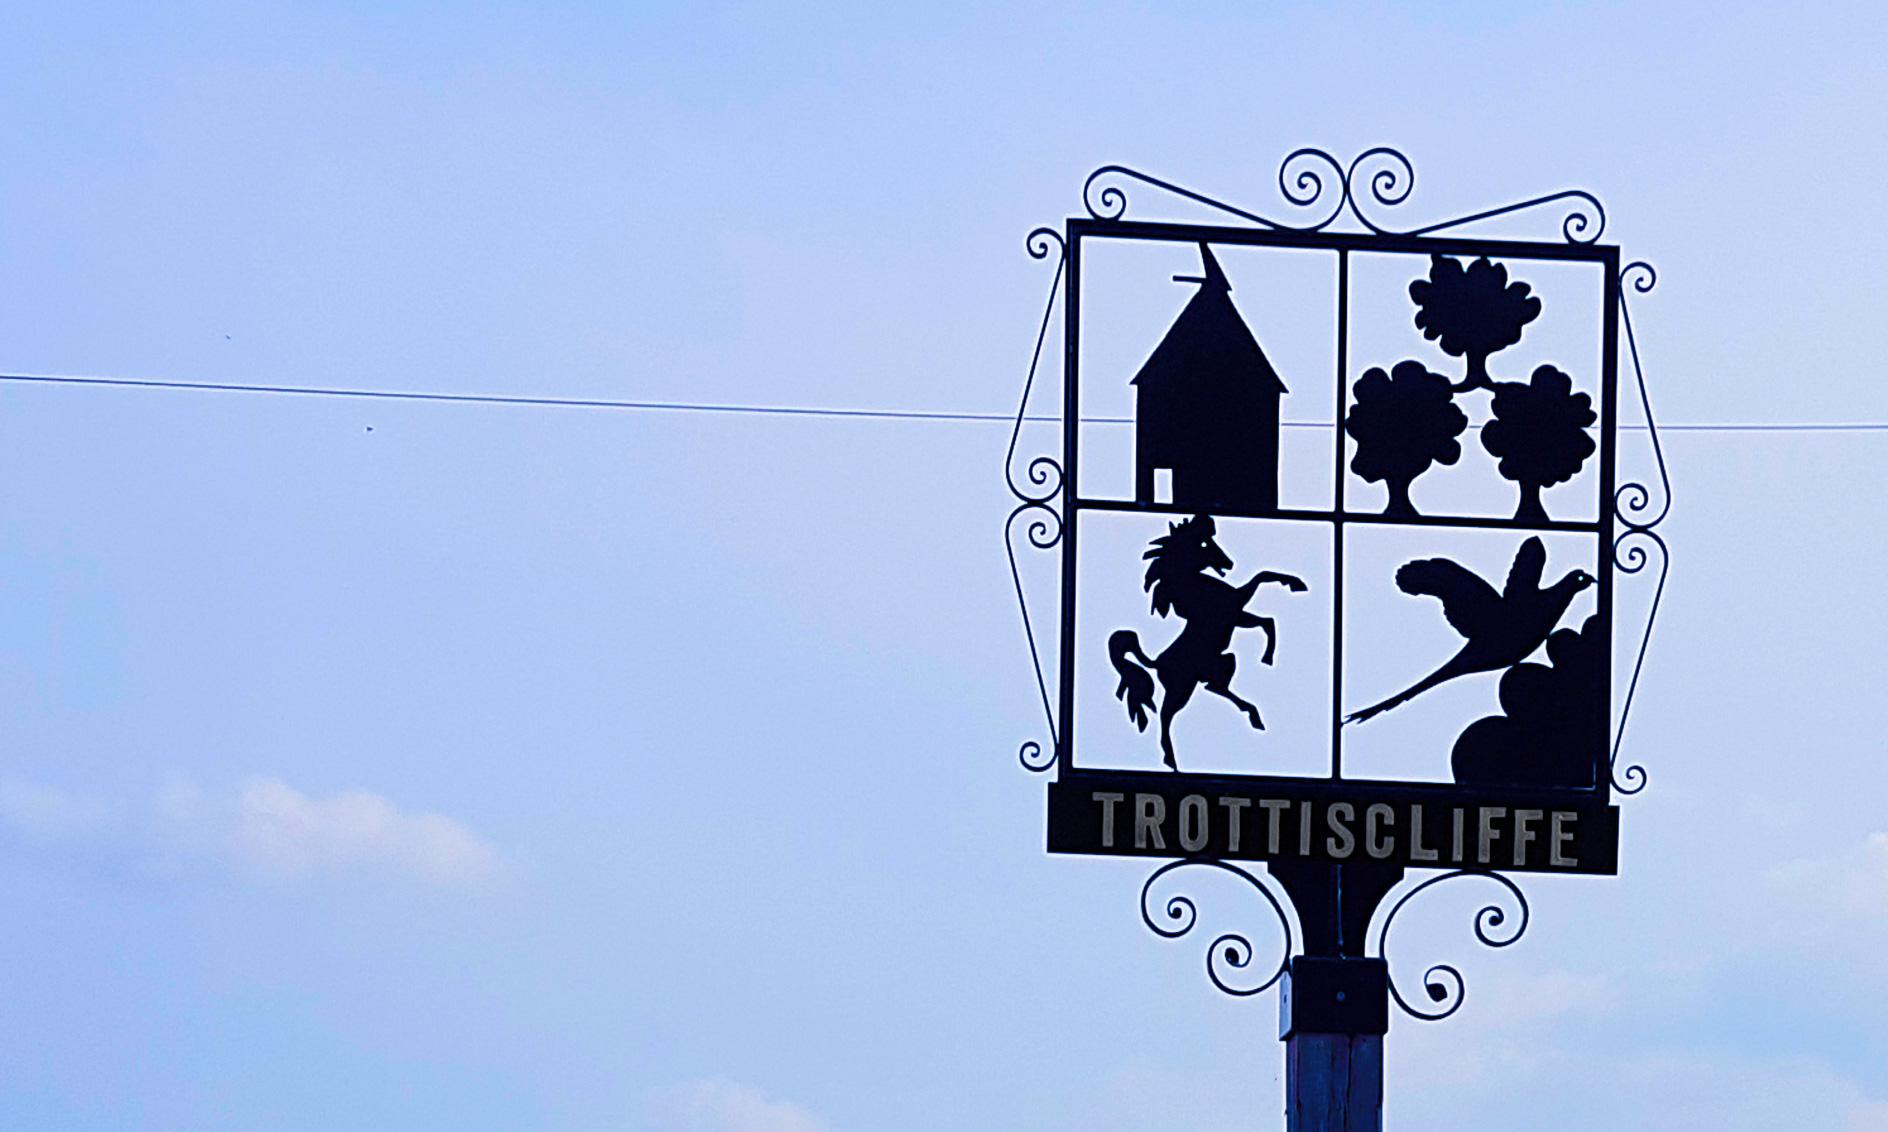 Trottiscliffe Village Sign